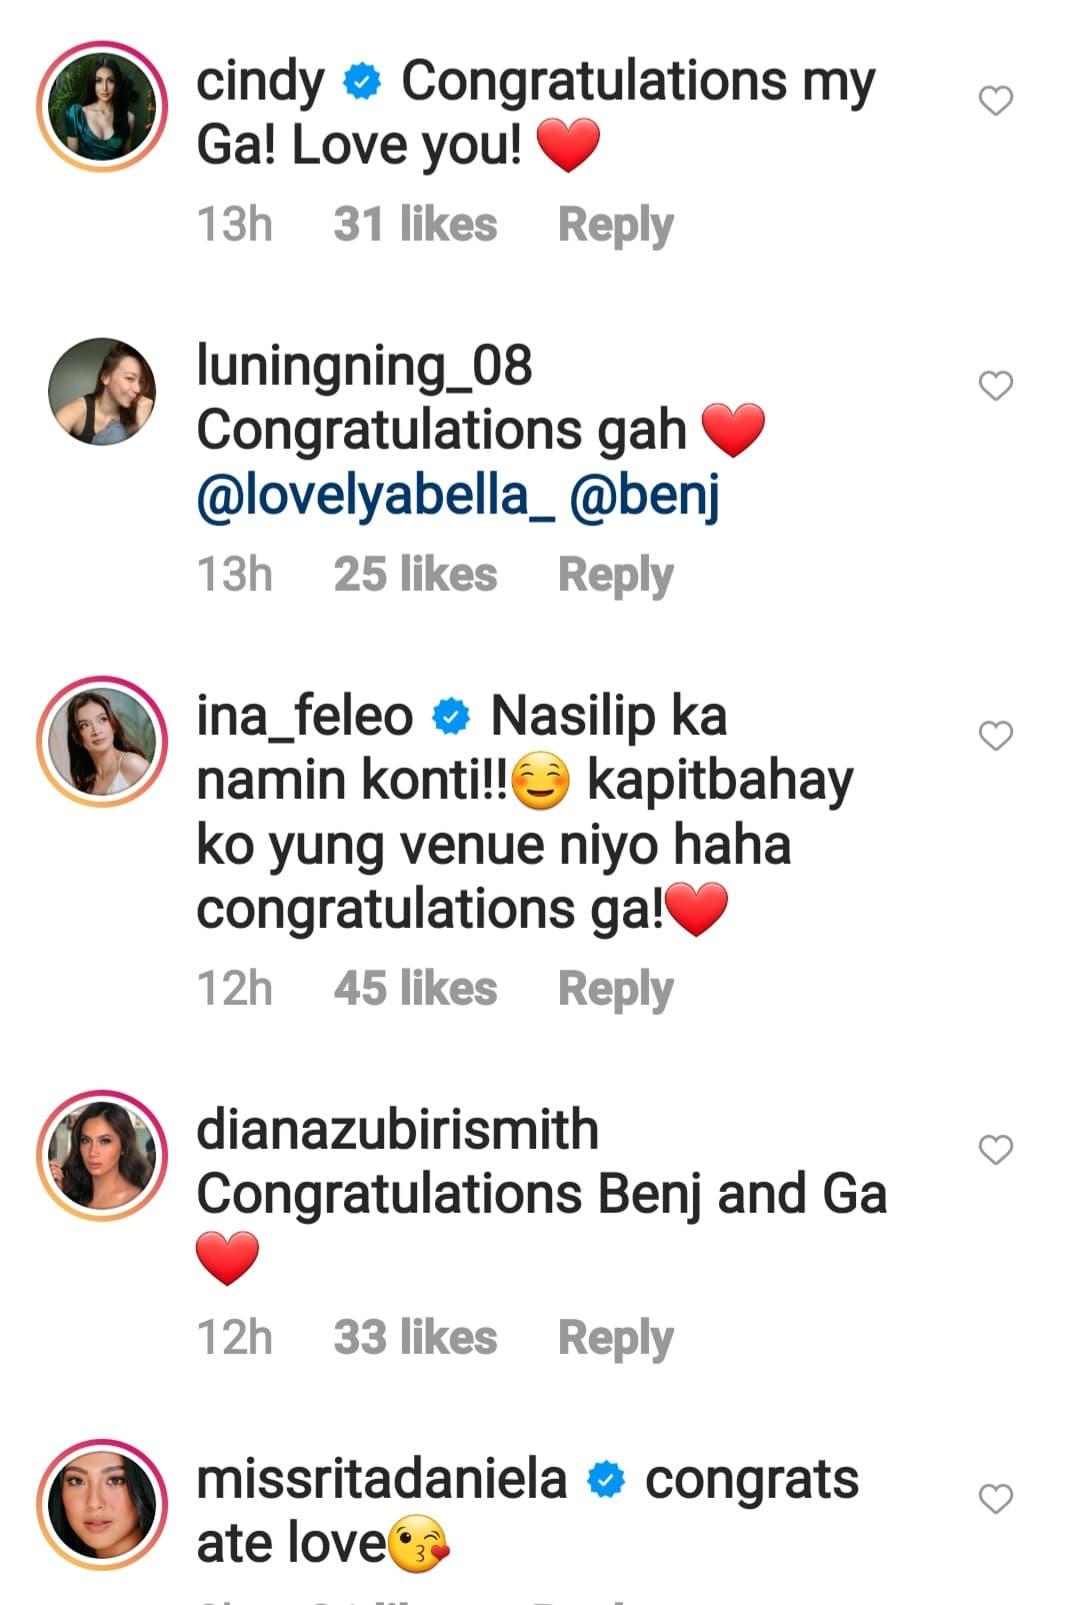 celebs including diana zubiri congratulates newly weds